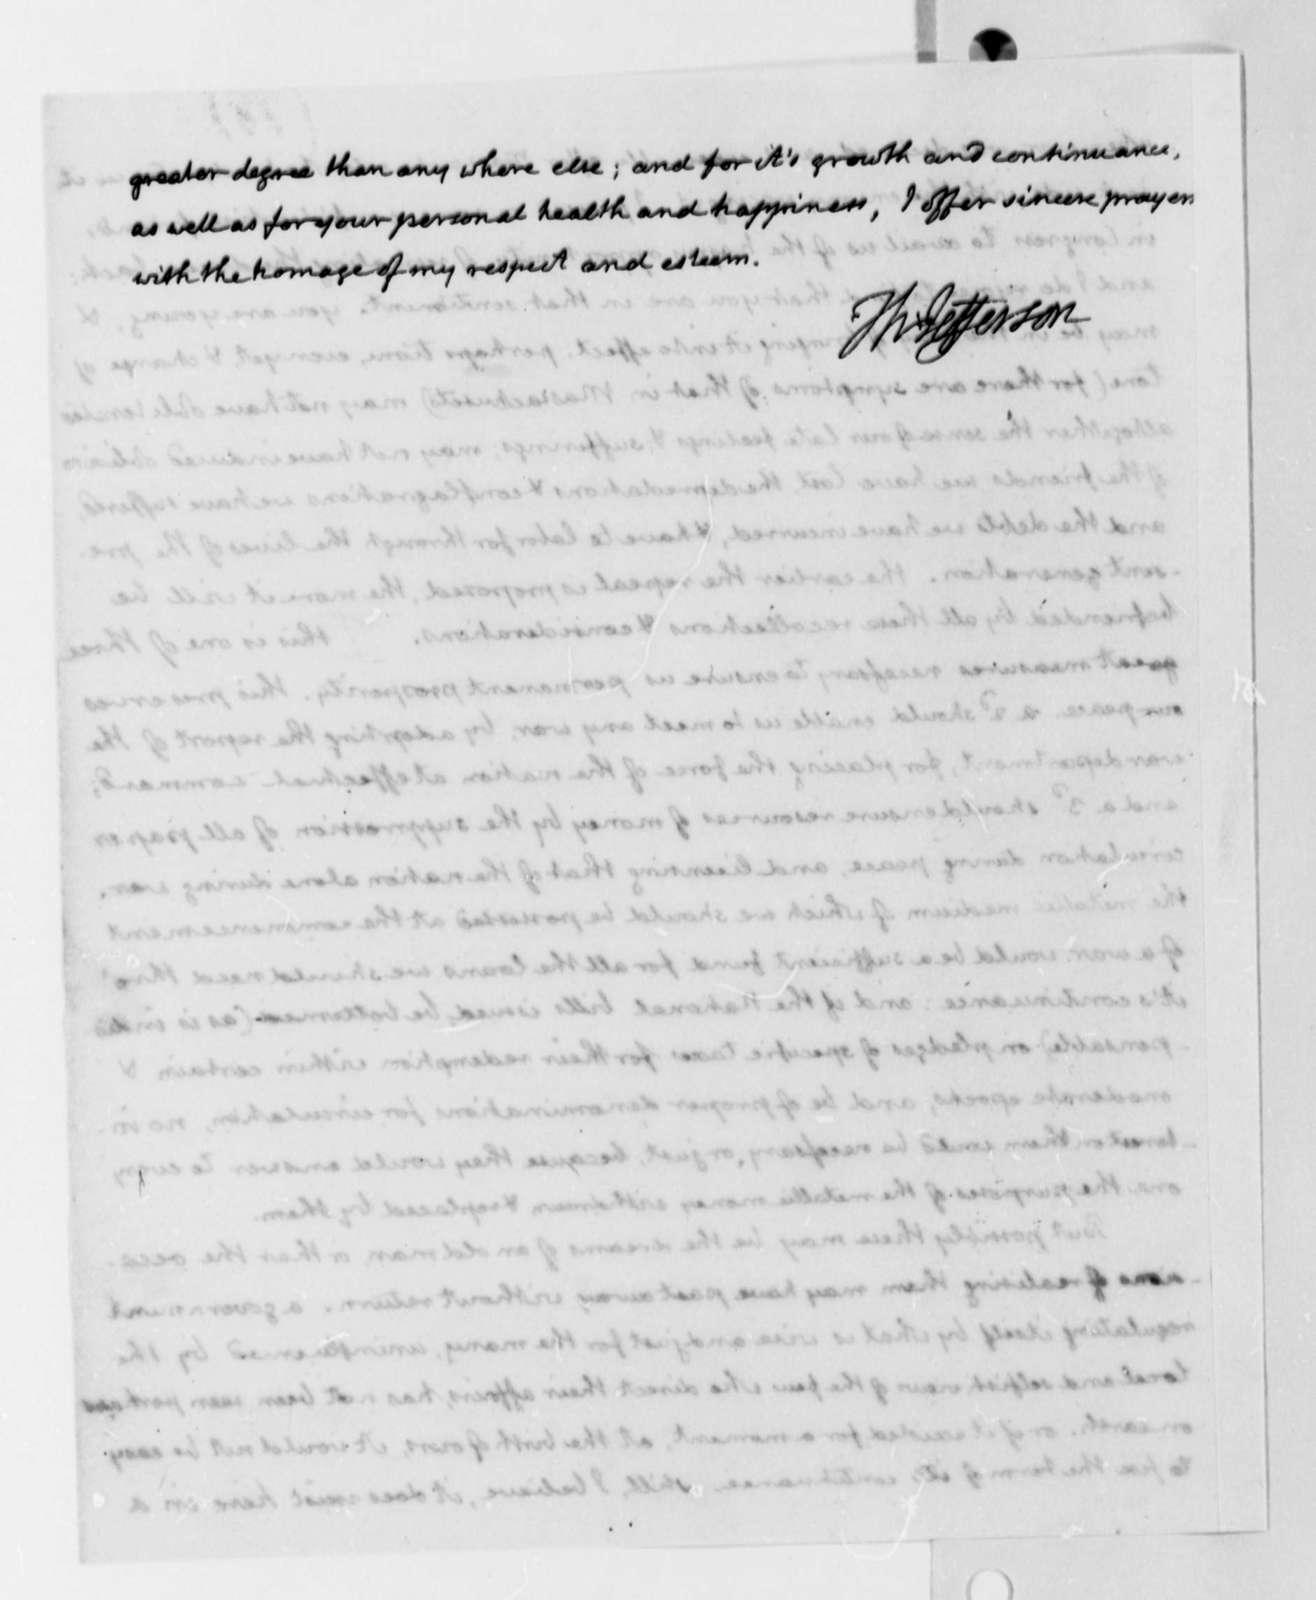 Thomas Jefferson to William H. Crawford, June 20, 1816